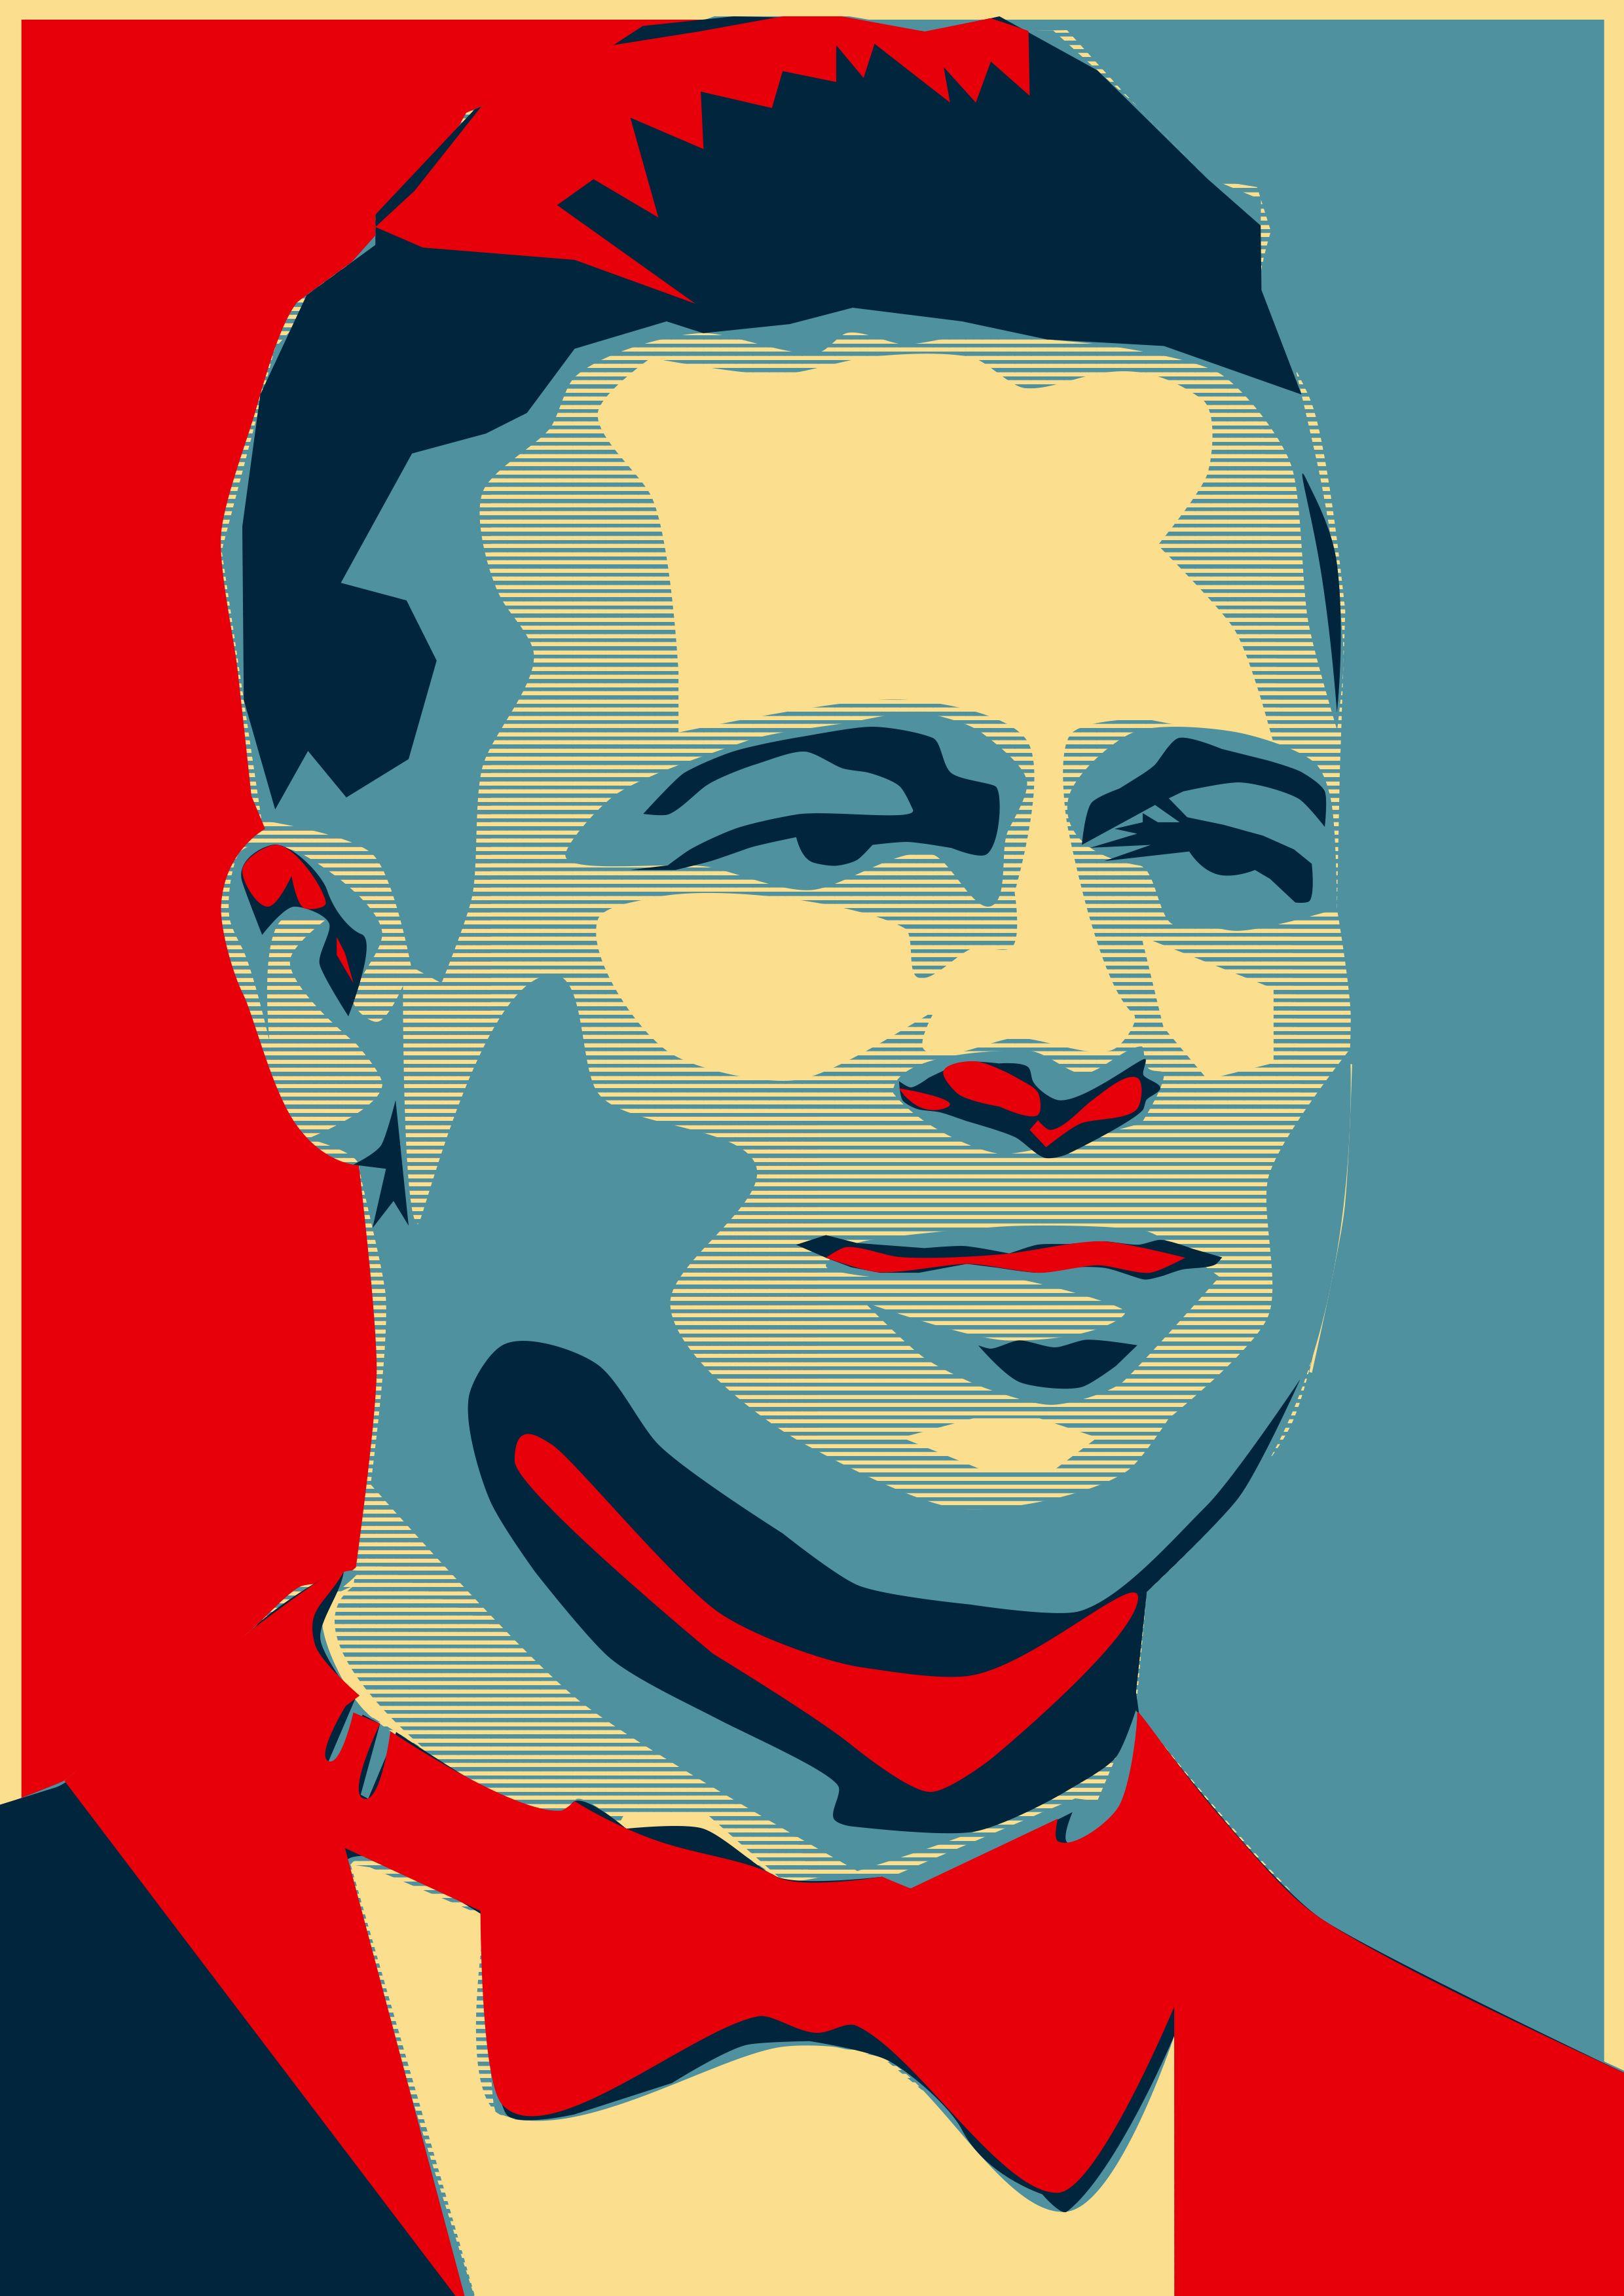 Illustrator Poster Brad Pitt